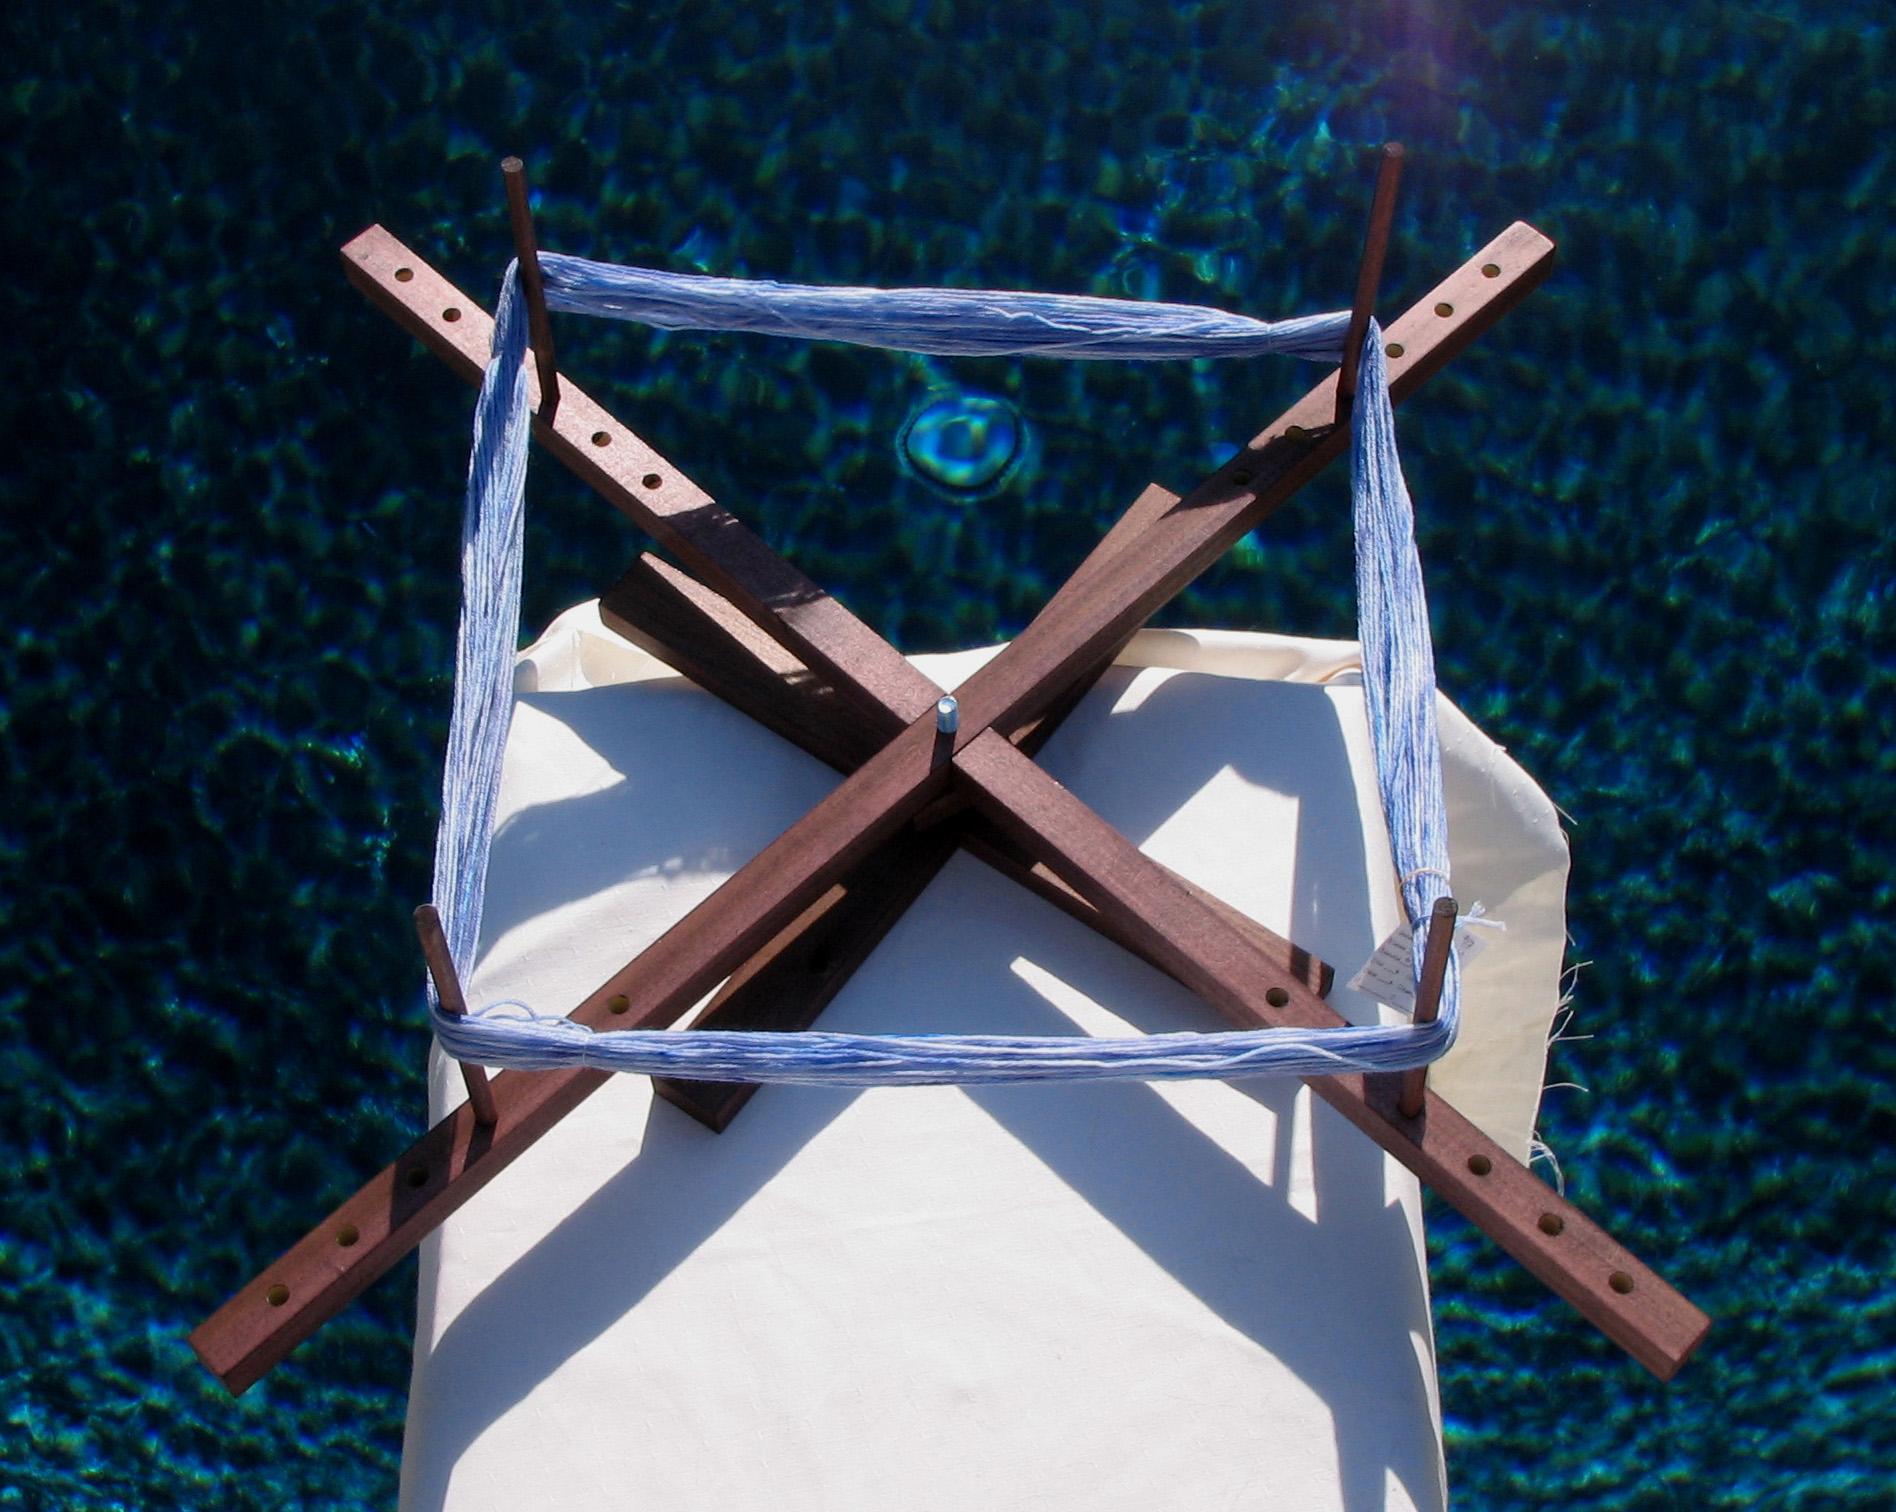 SewUseful: Portable Tabletop Yarn Swift (for winding yarn)